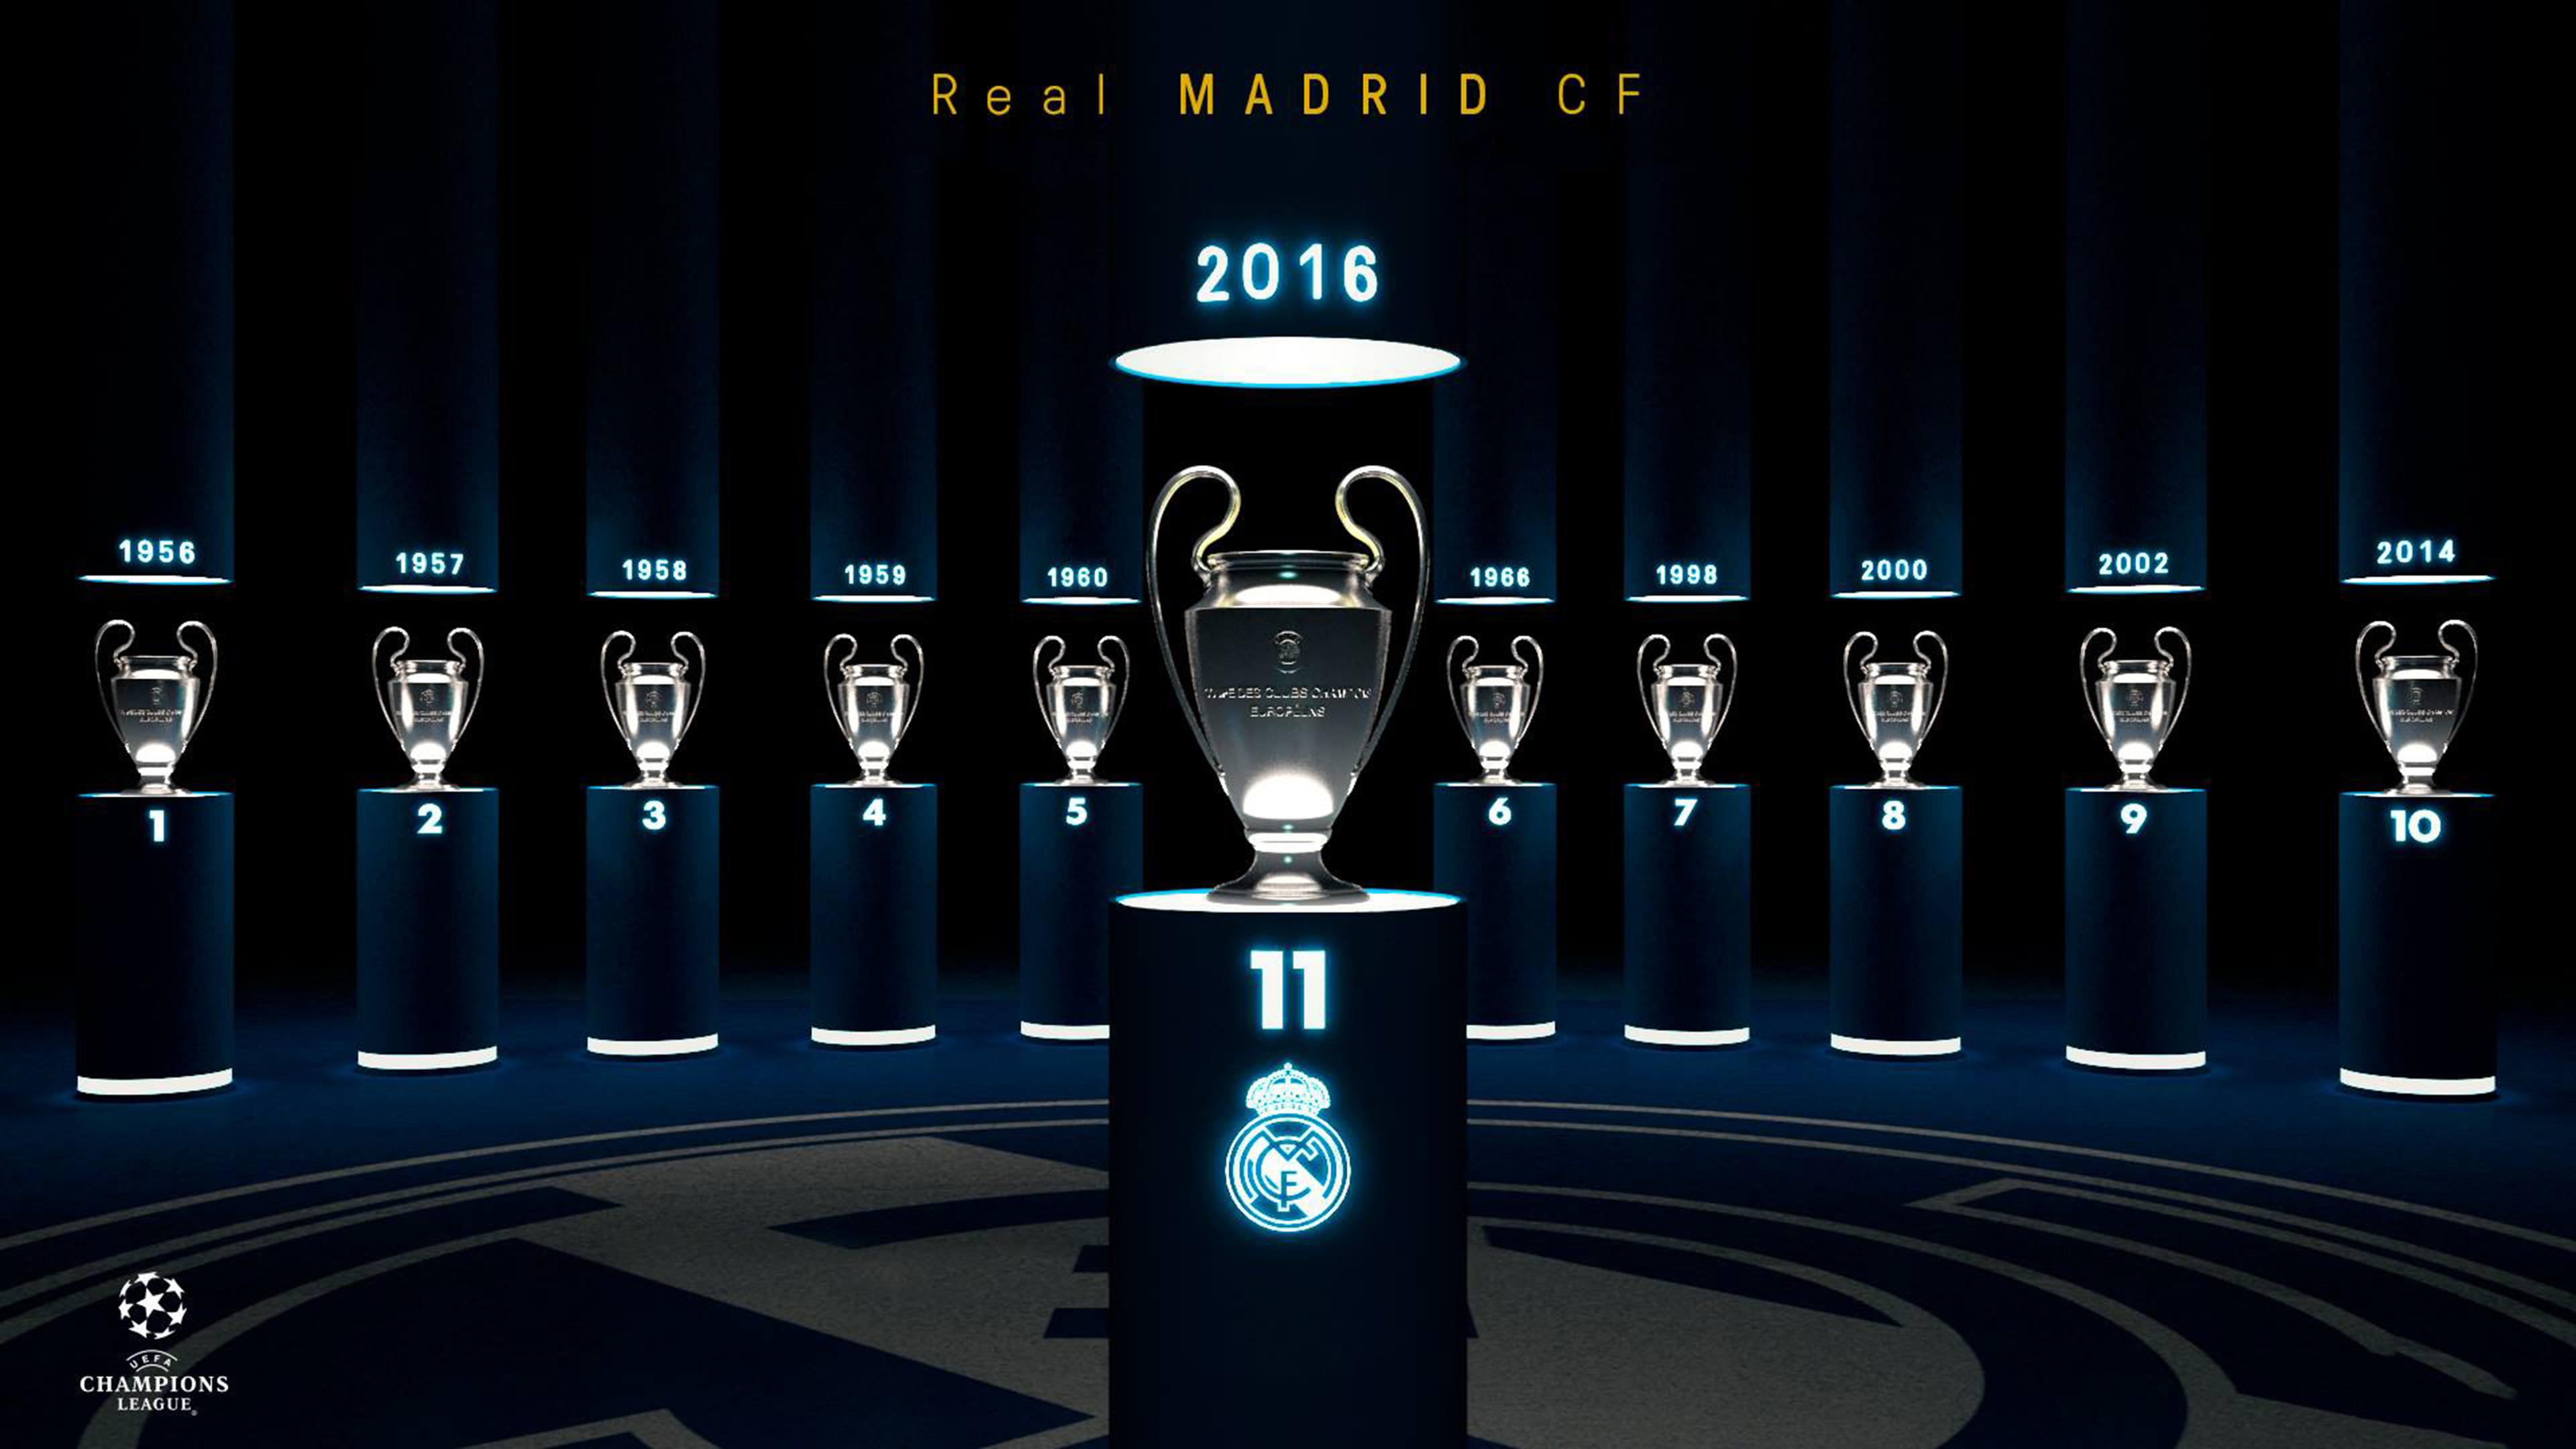 1920x1200 Real Madrid International Champions Cup